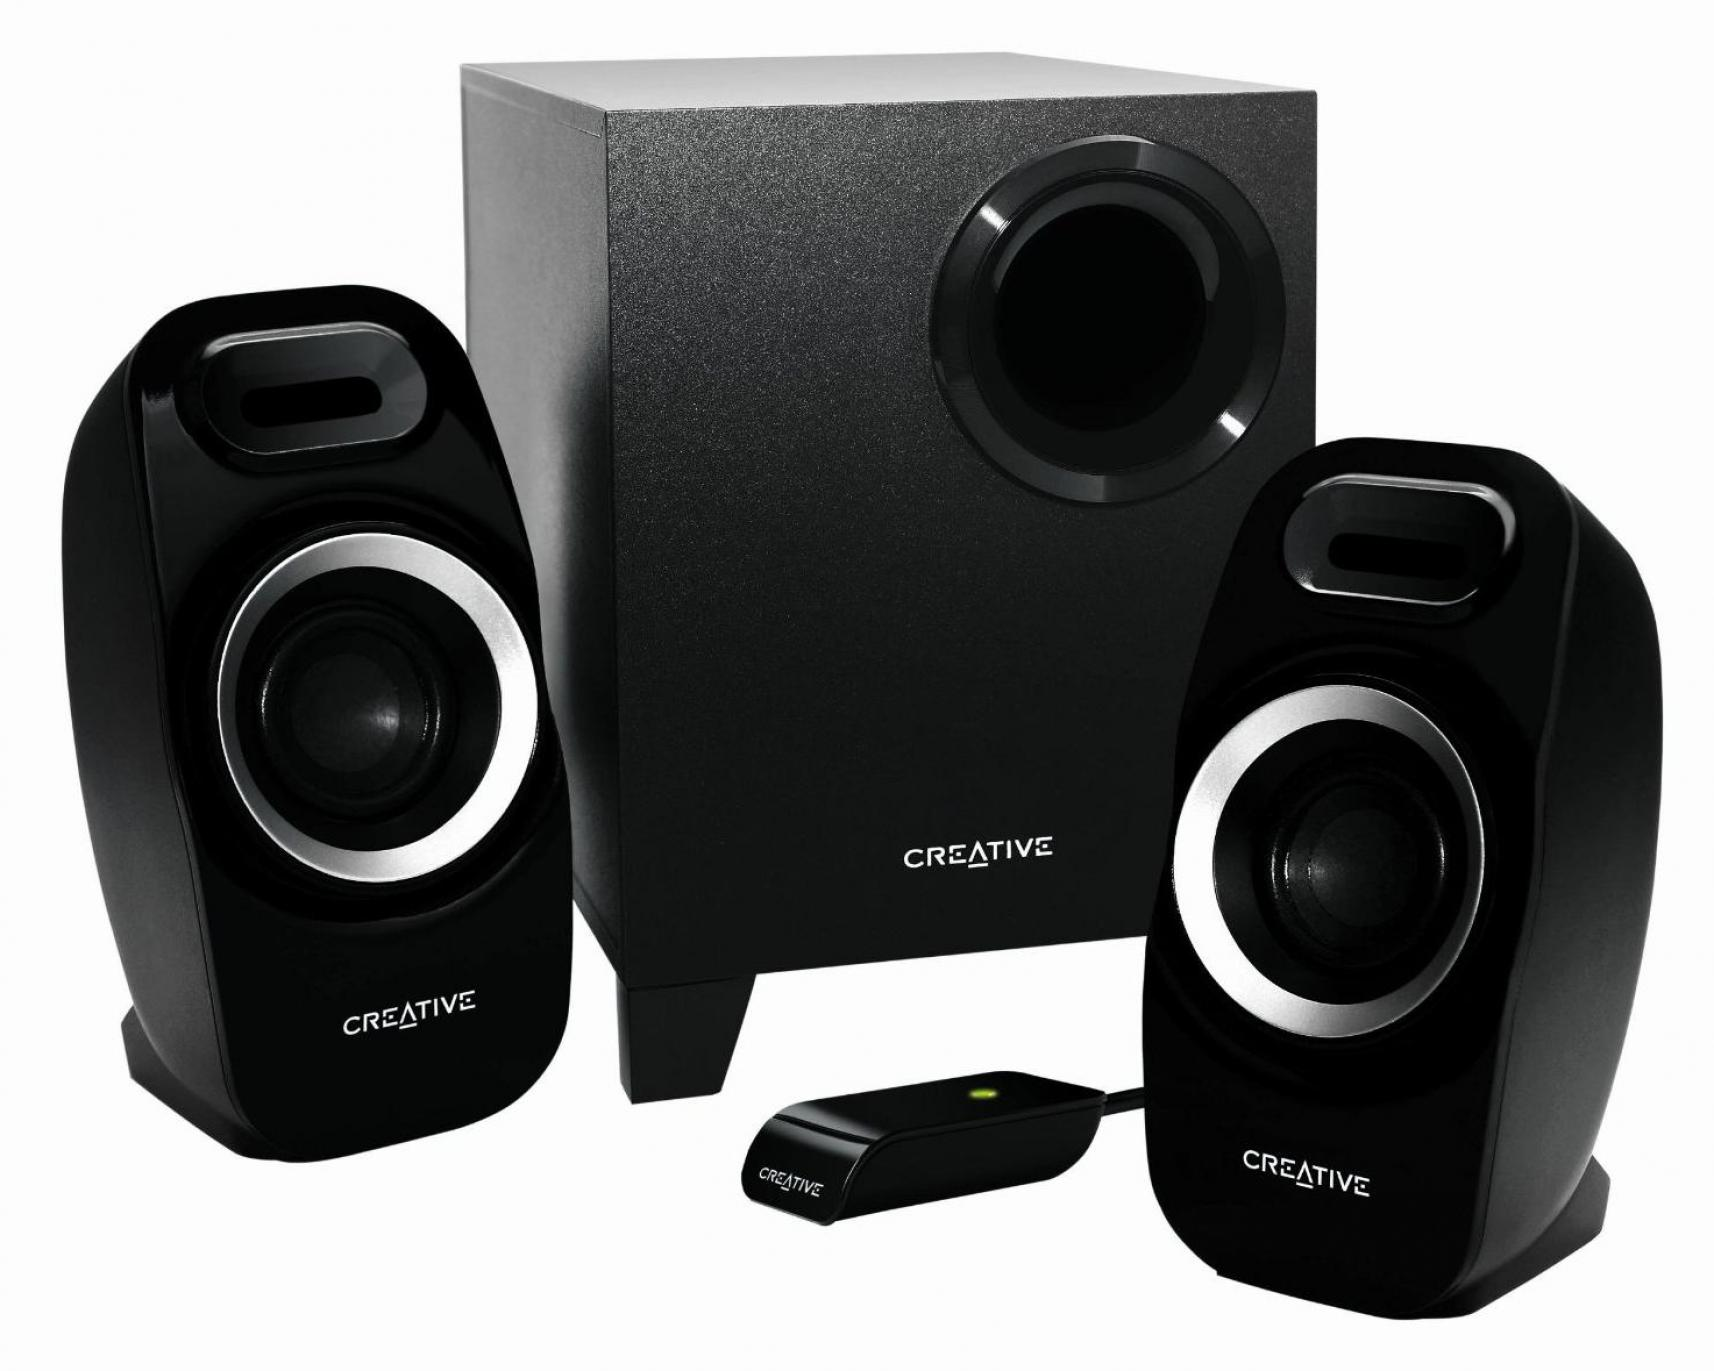 Logitech 980 000012 s120 2 piece black desktop computer speaker set - Creative Labs Speaker 51mf0415aa002 Inspire T3300 2 1 Speaker System Retail Walmart Com